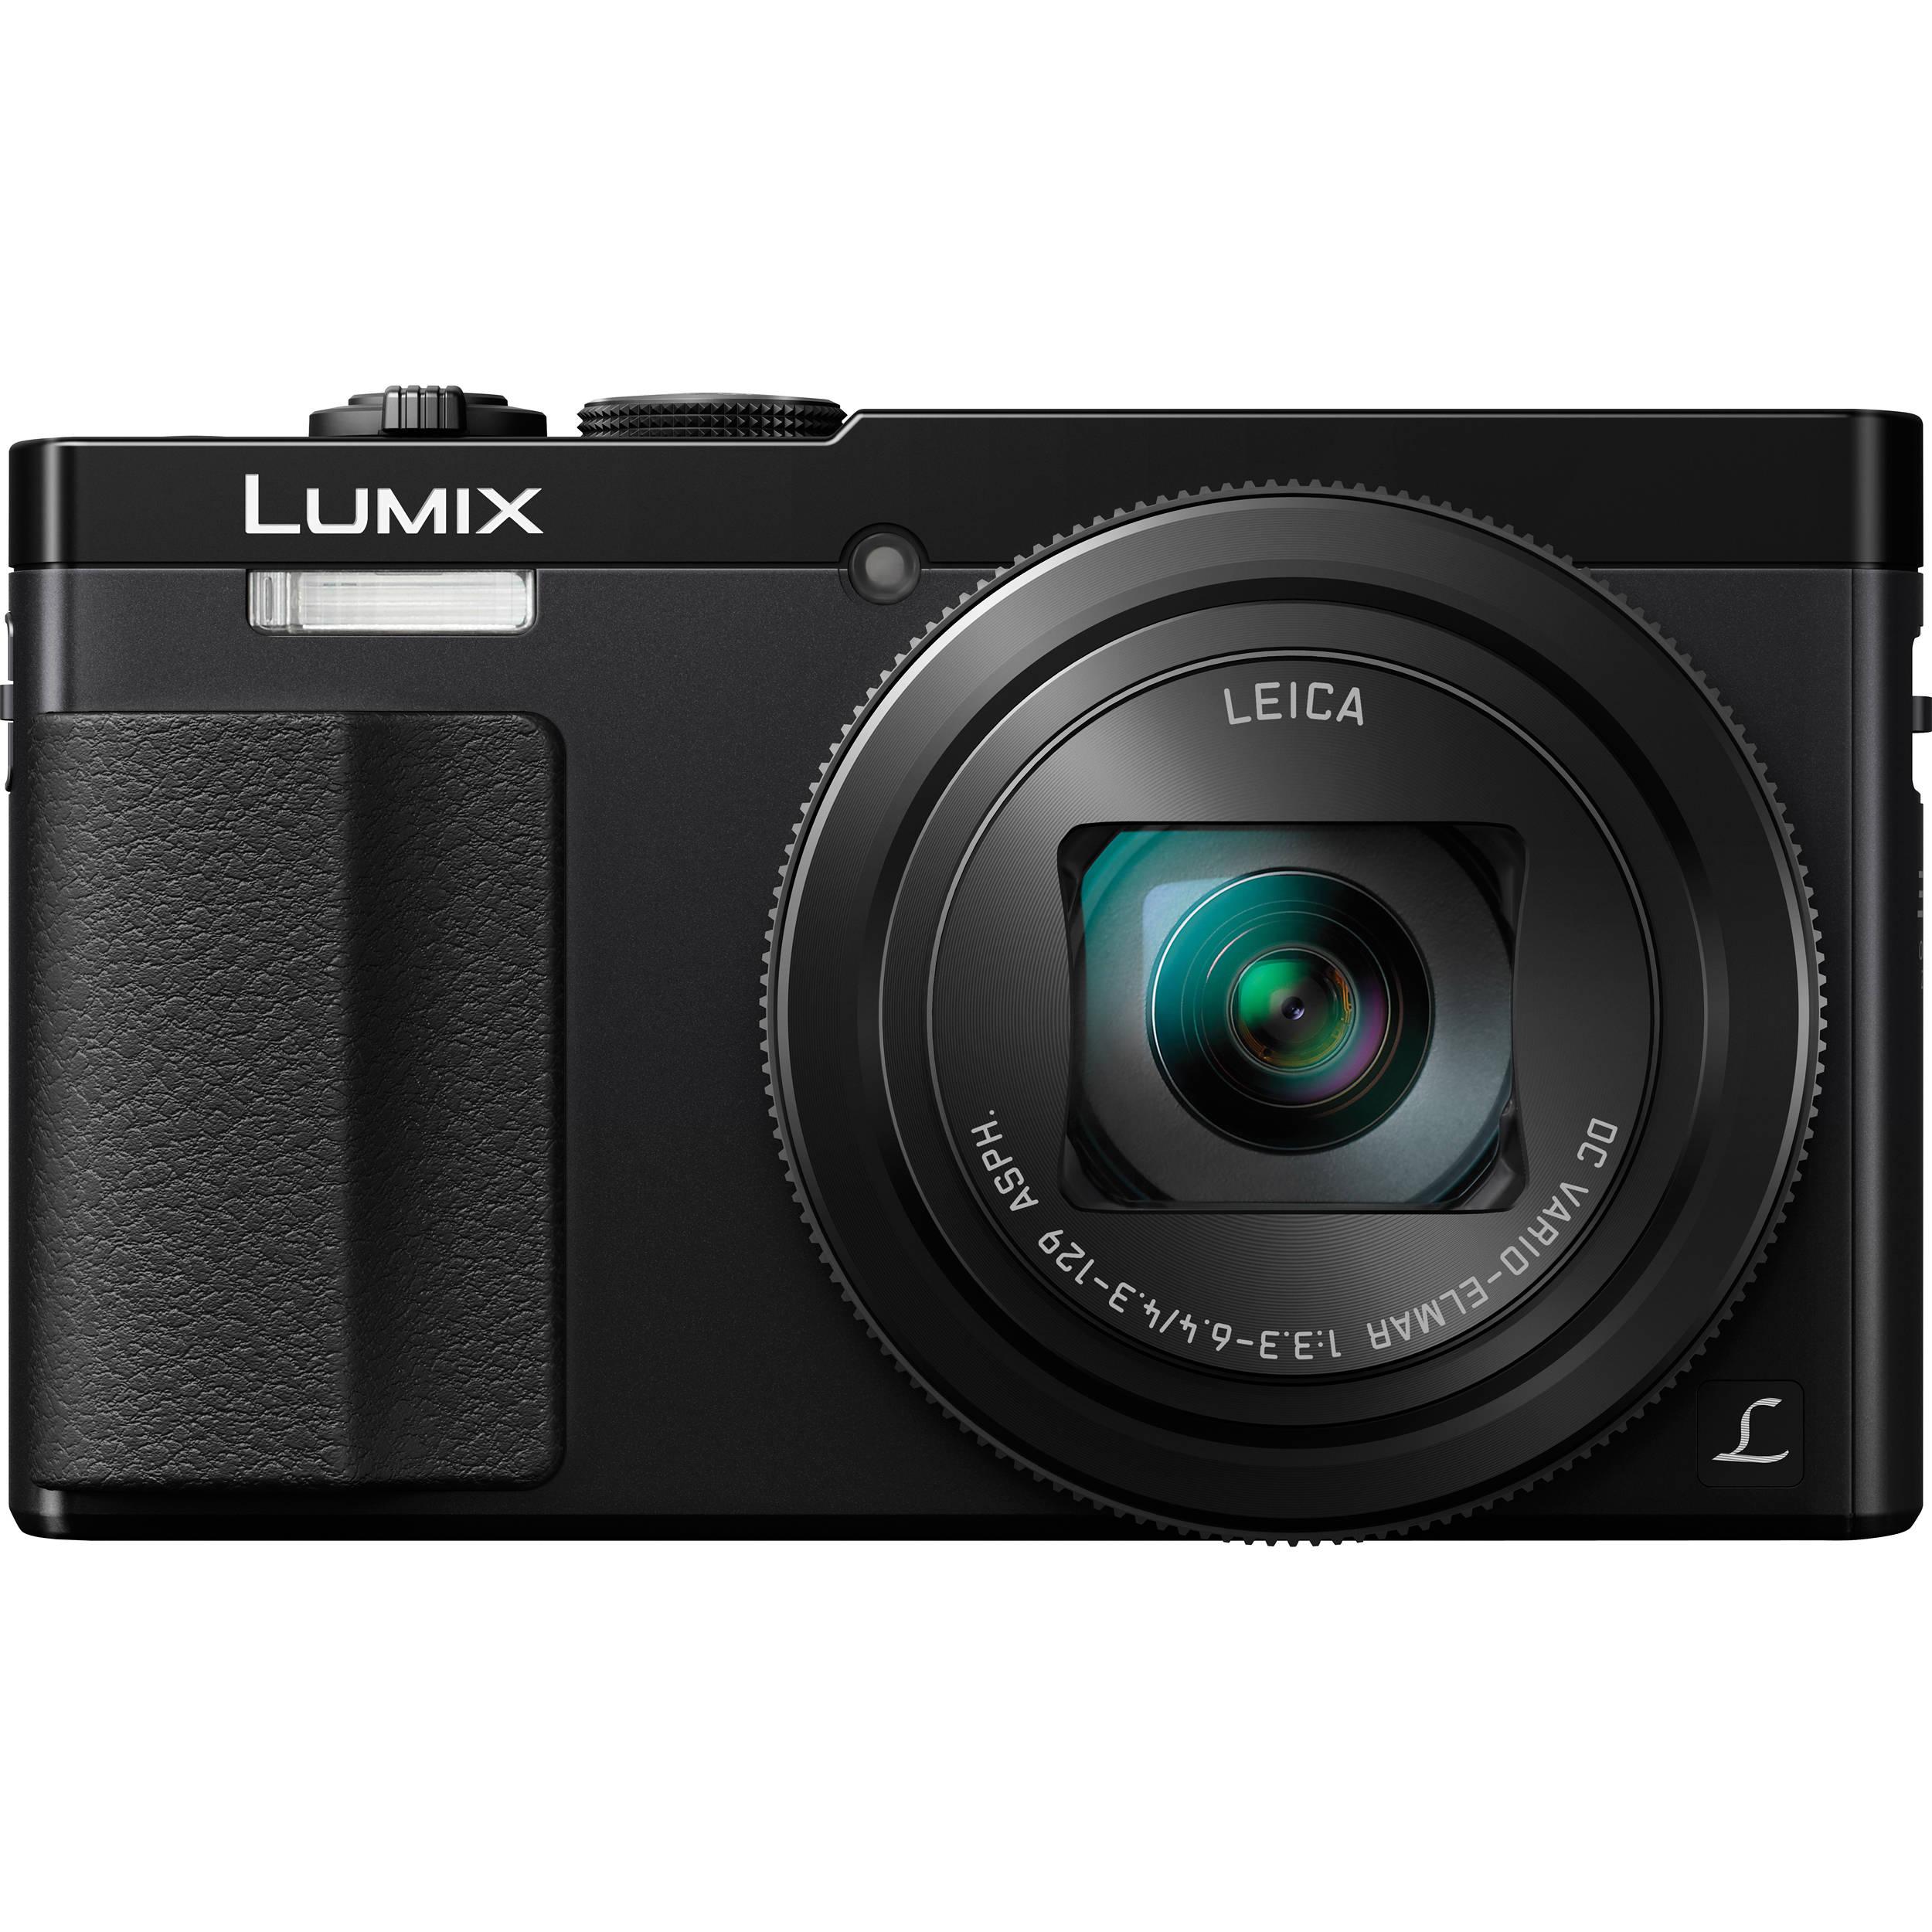 Panasonic Lumix DMC-ZS50 Digital Camera (Black) DMC-ZS50K B&H